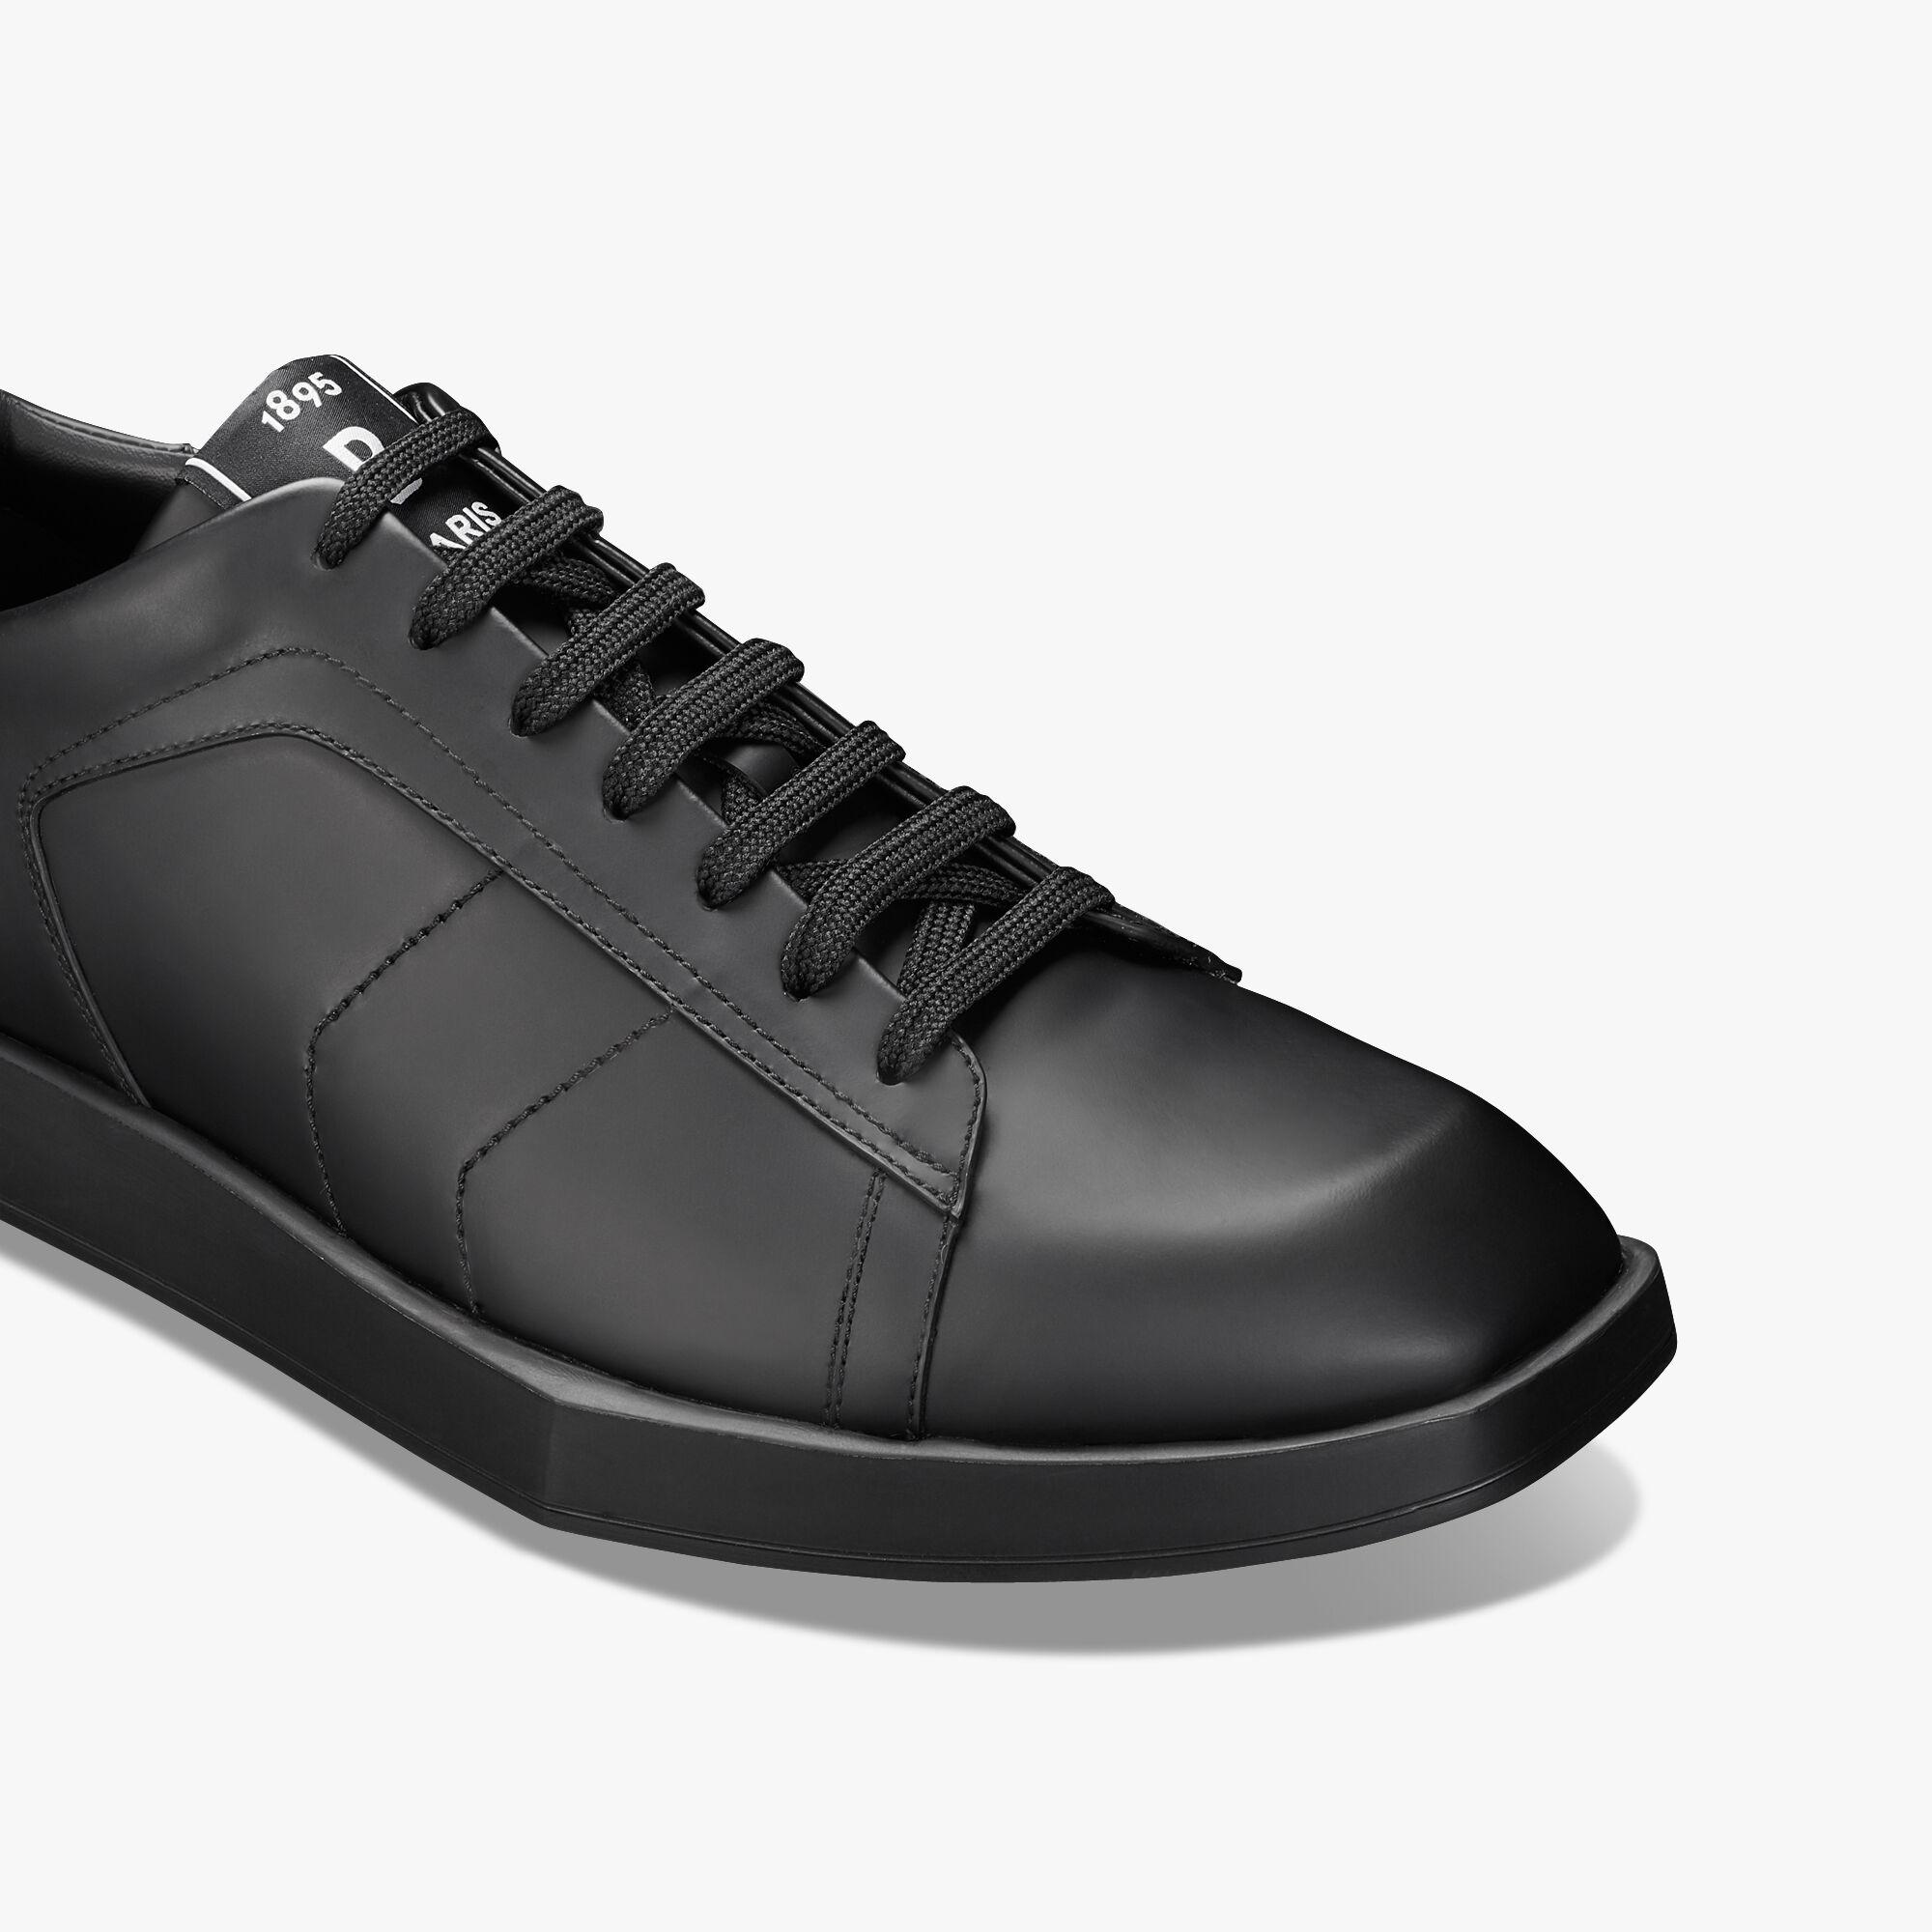 Stellar 小牛皮运动鞋- Berluti